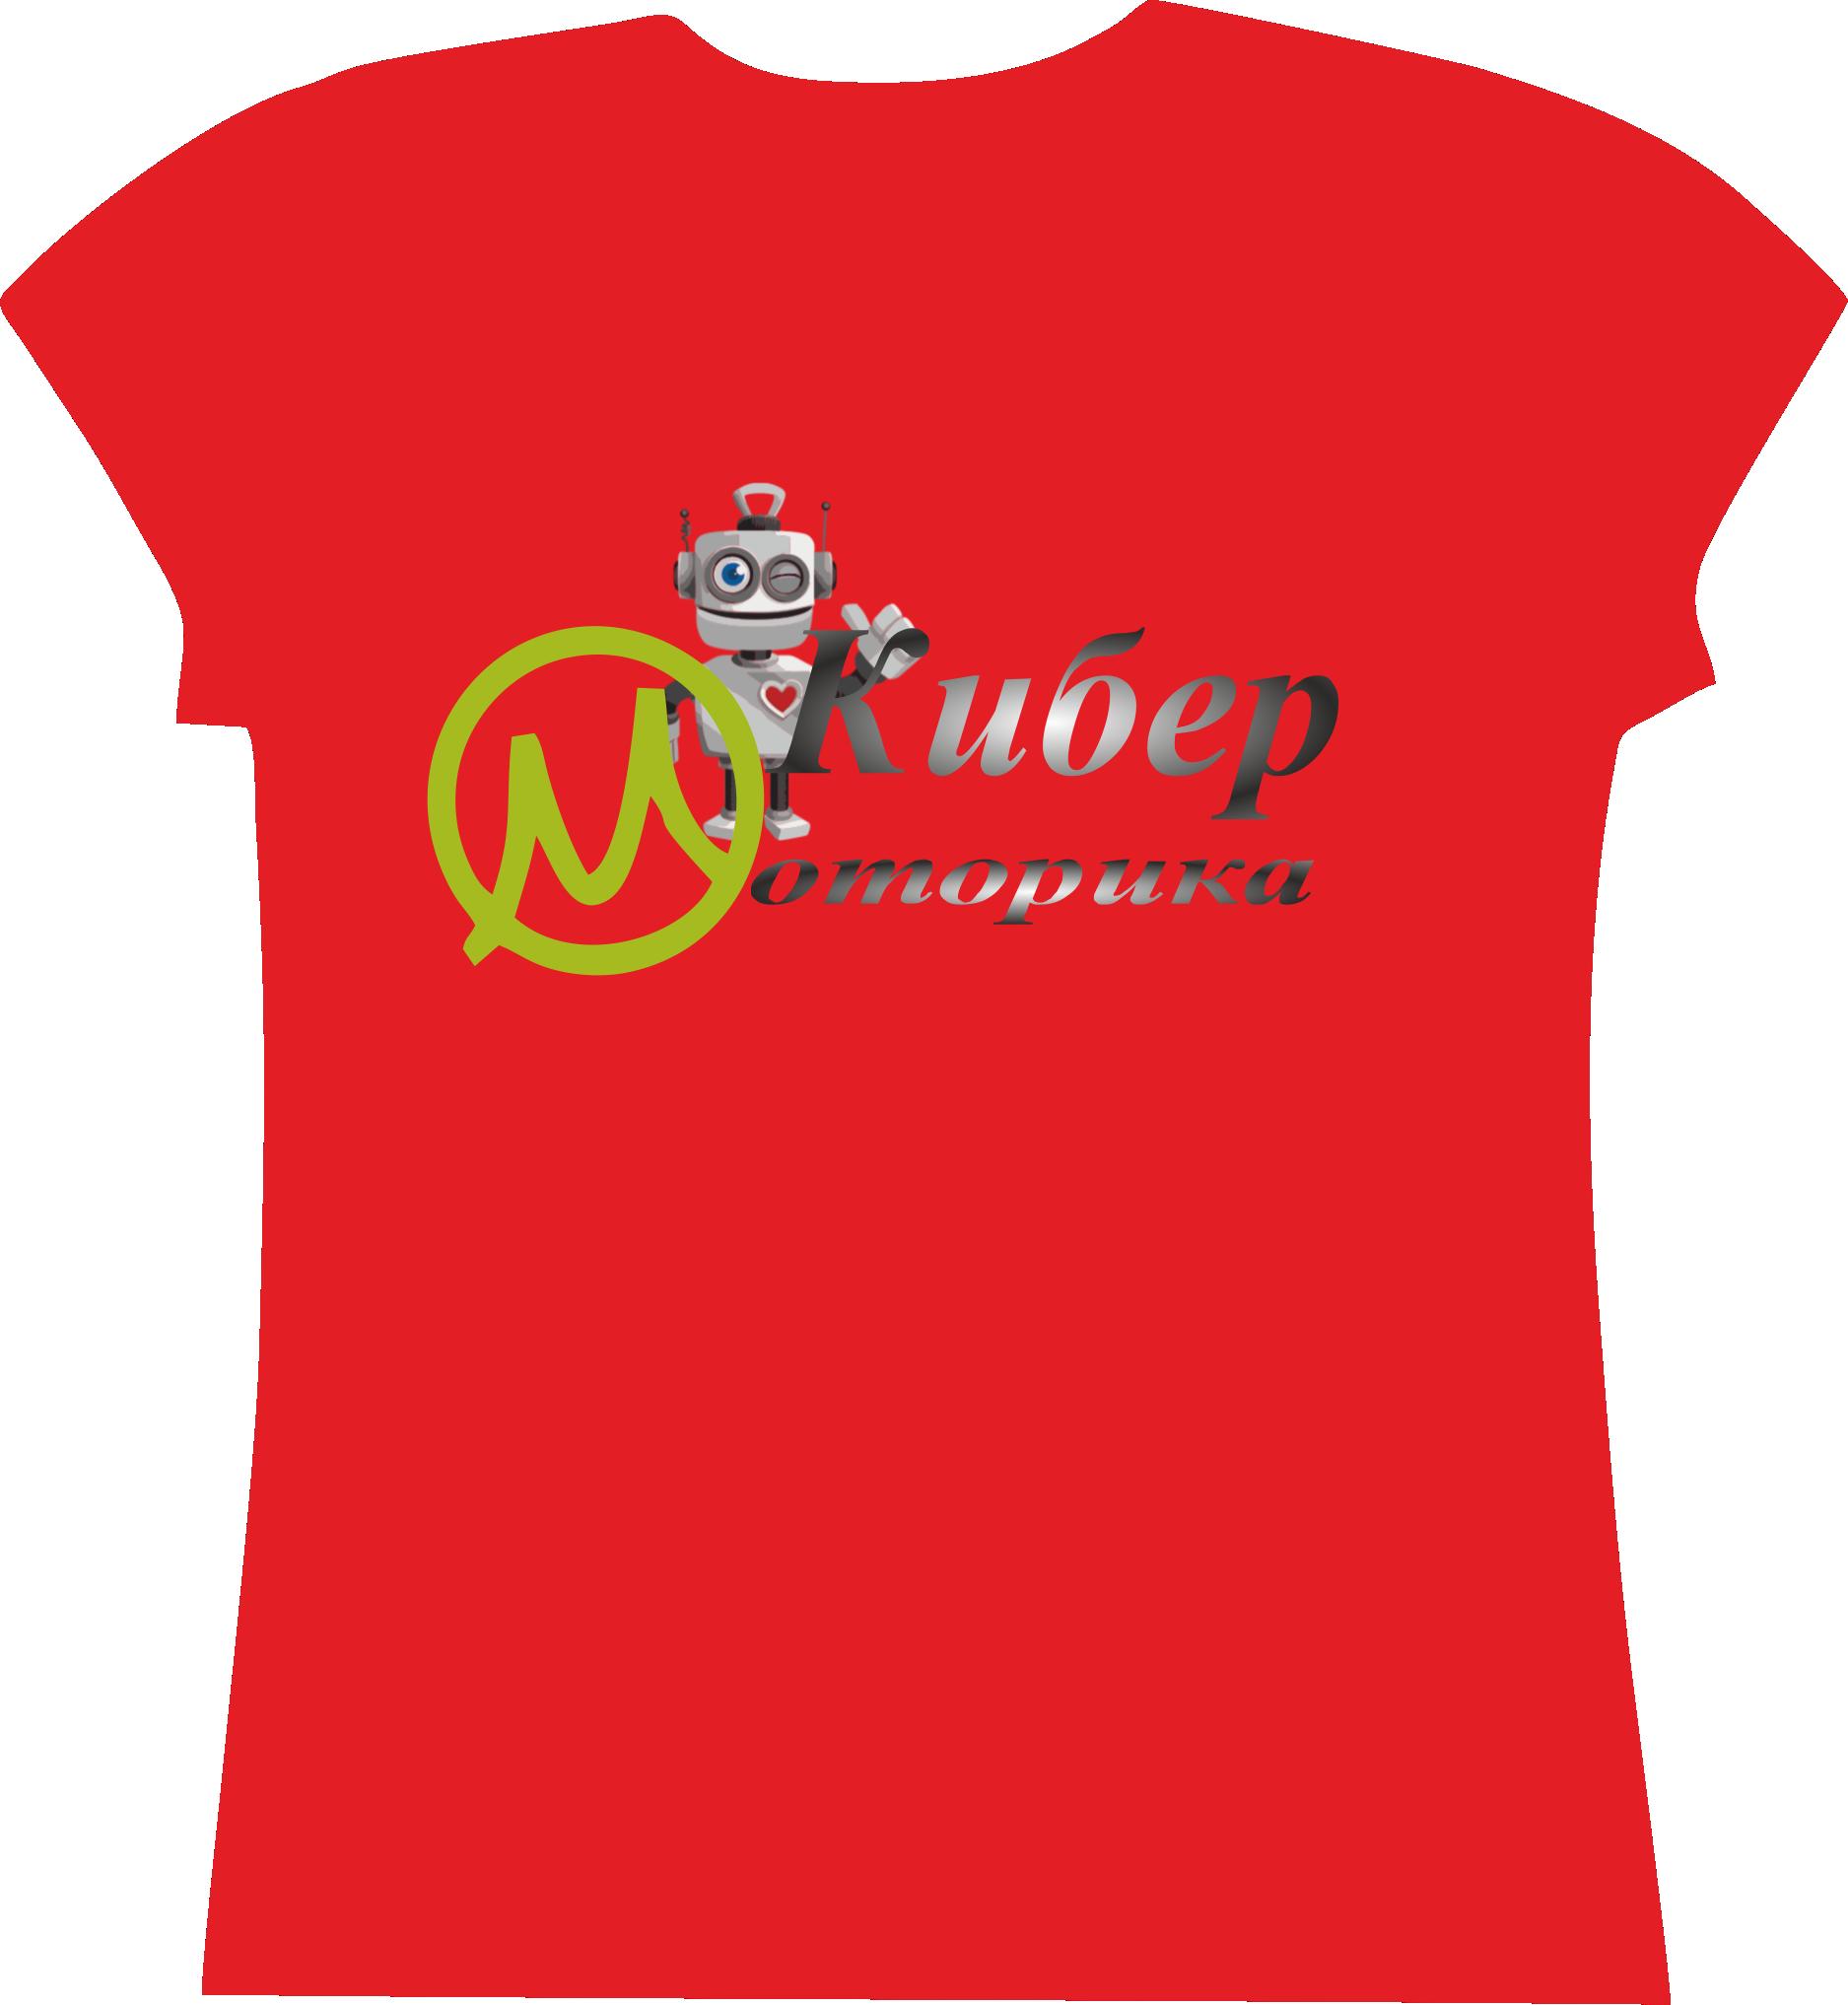 Нарисовать принты на футболки для компании Моторика фото f_648609ce0817ae4a.png